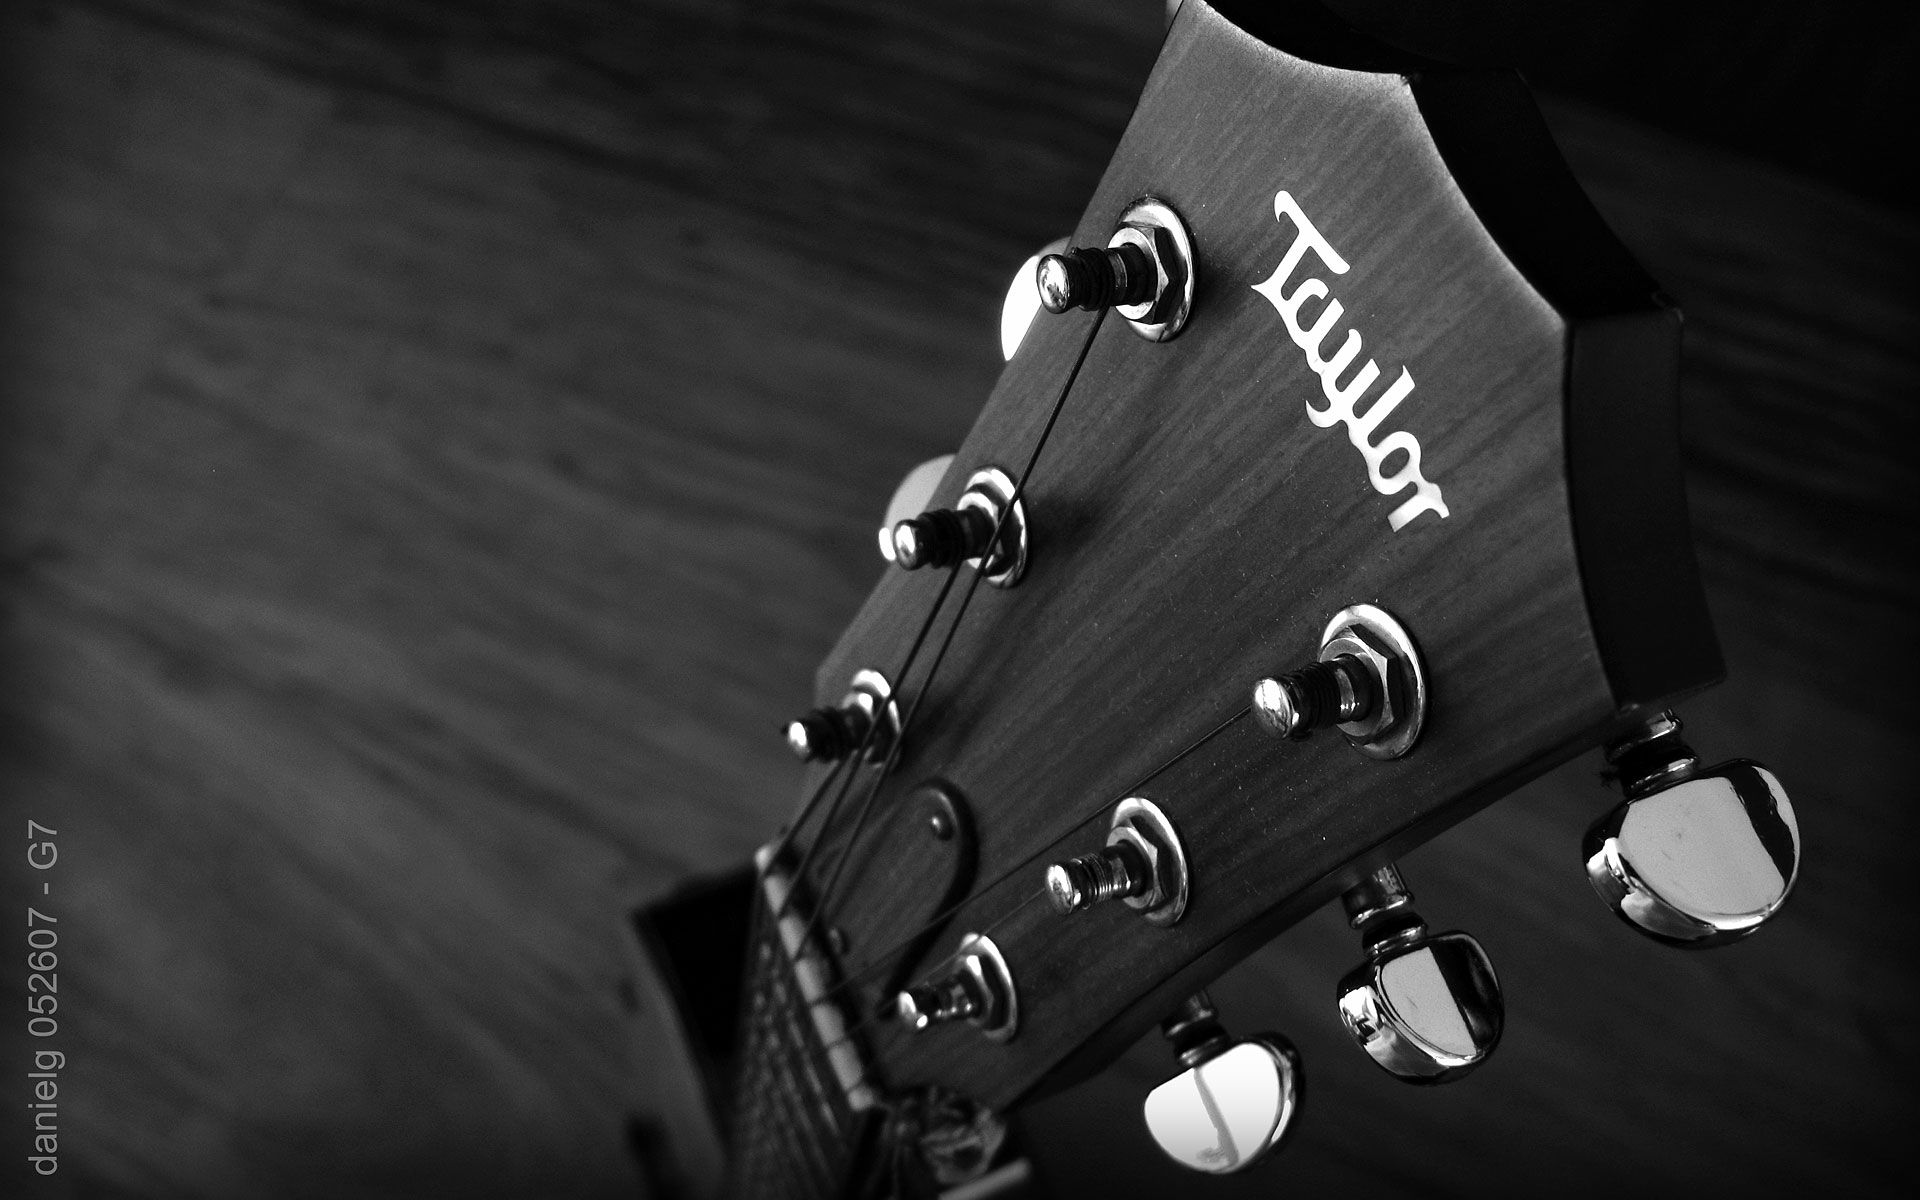 Acoustic Guitar HD Wallpaper Px HDWallSource For Laptop 1920x1200